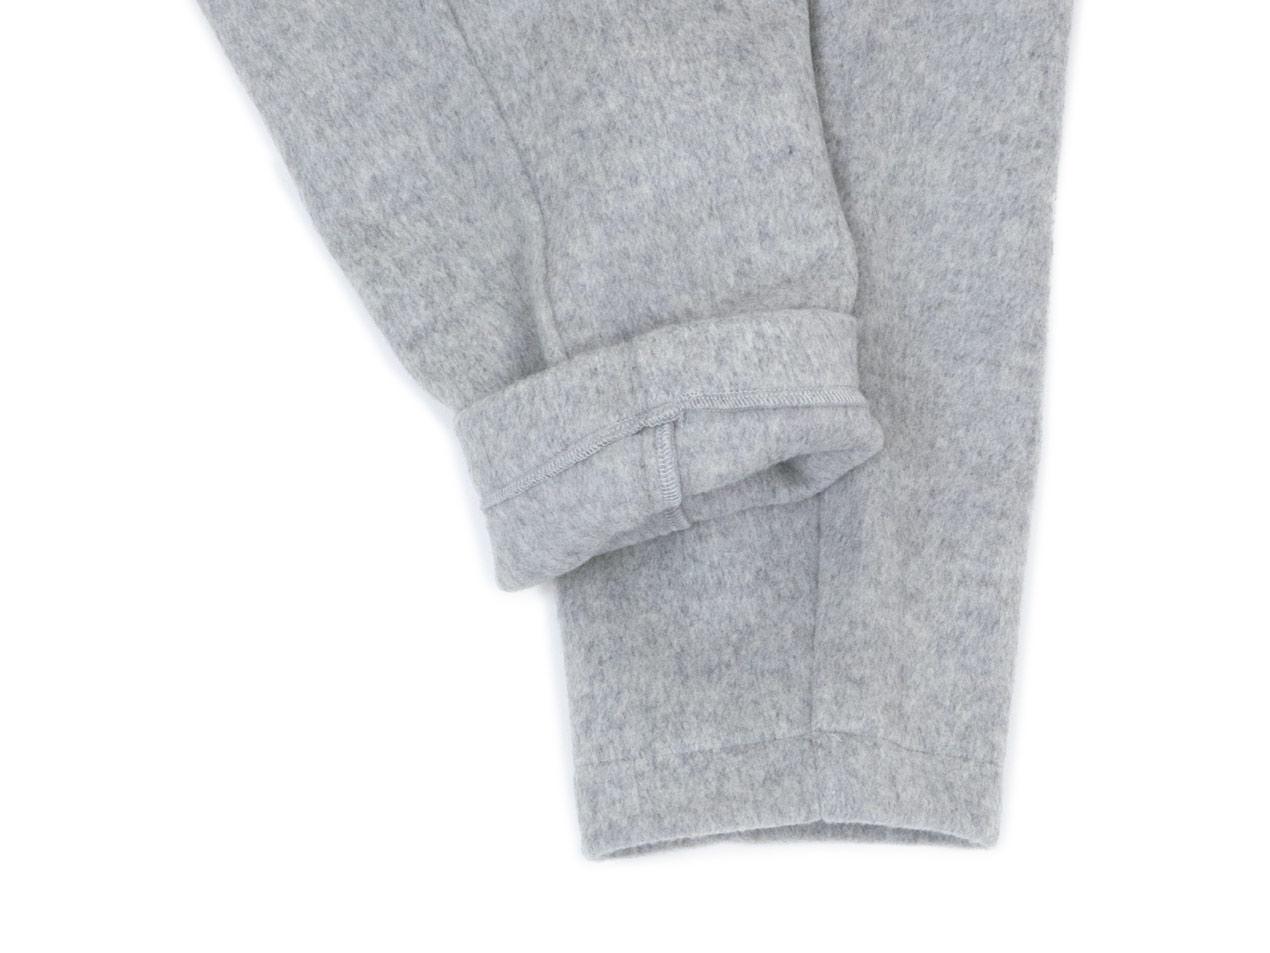 maillot mature melton easy trouser